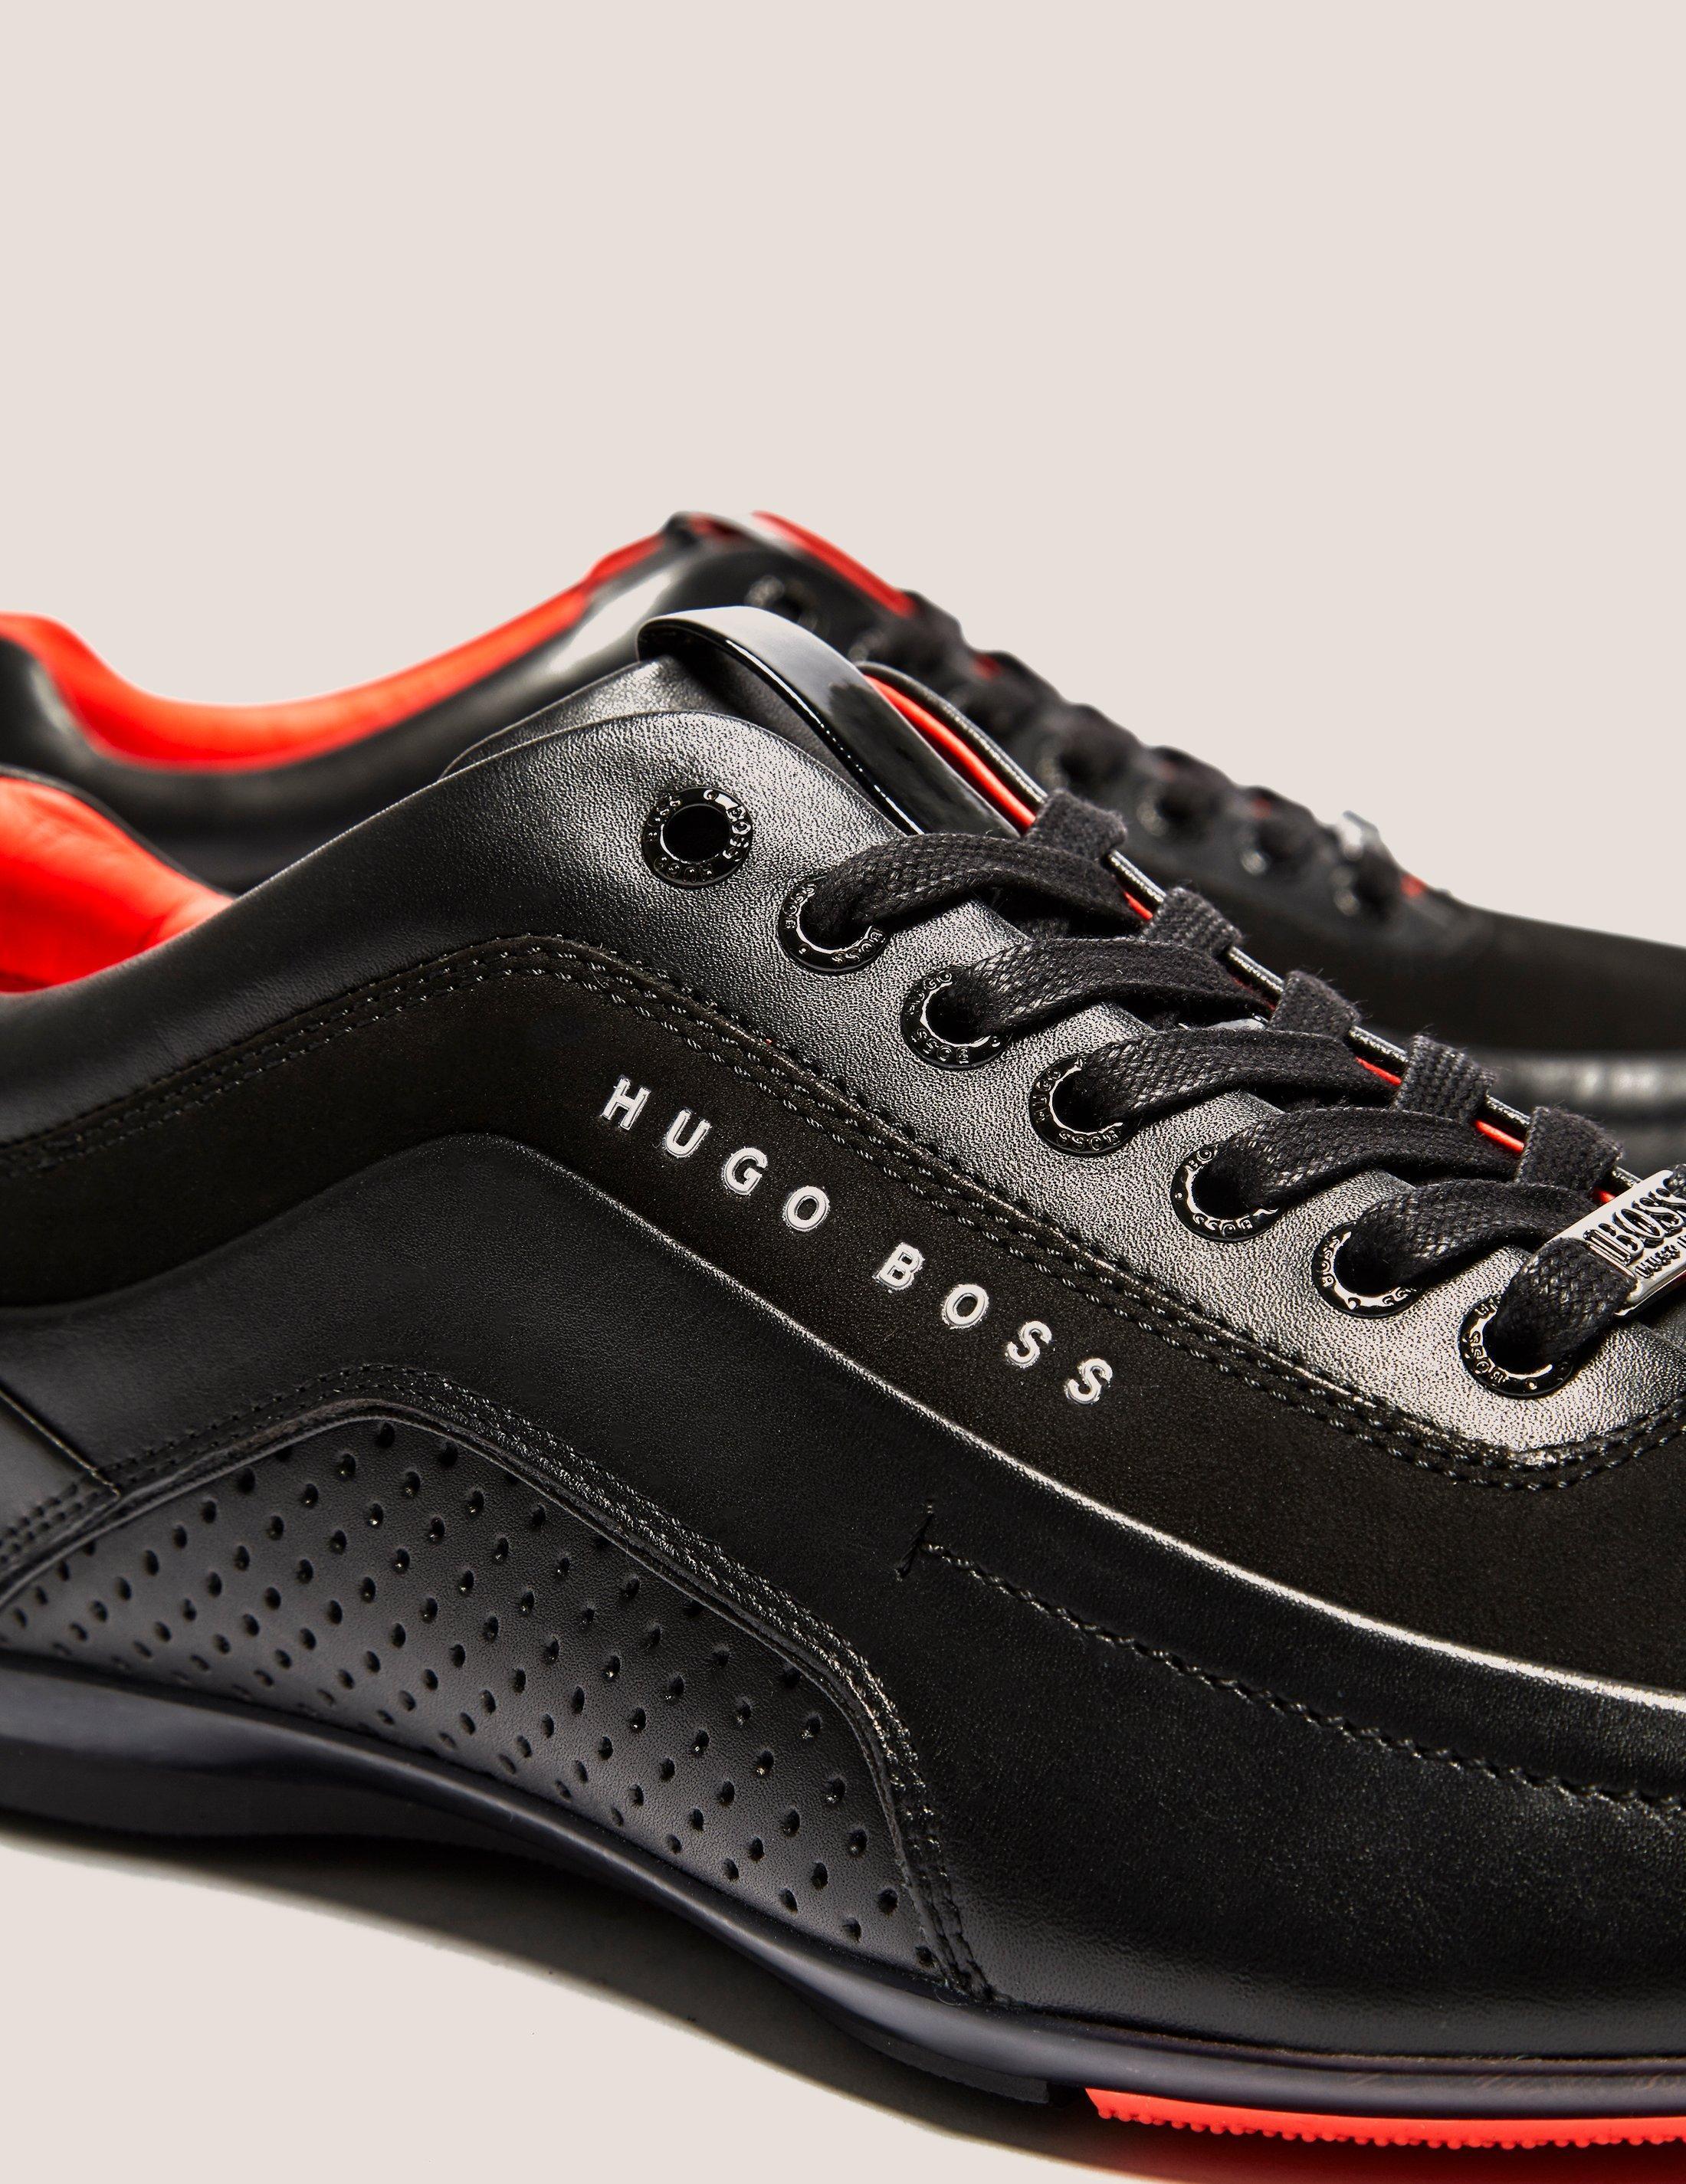 Hugo Boss Leather Racing Trainer